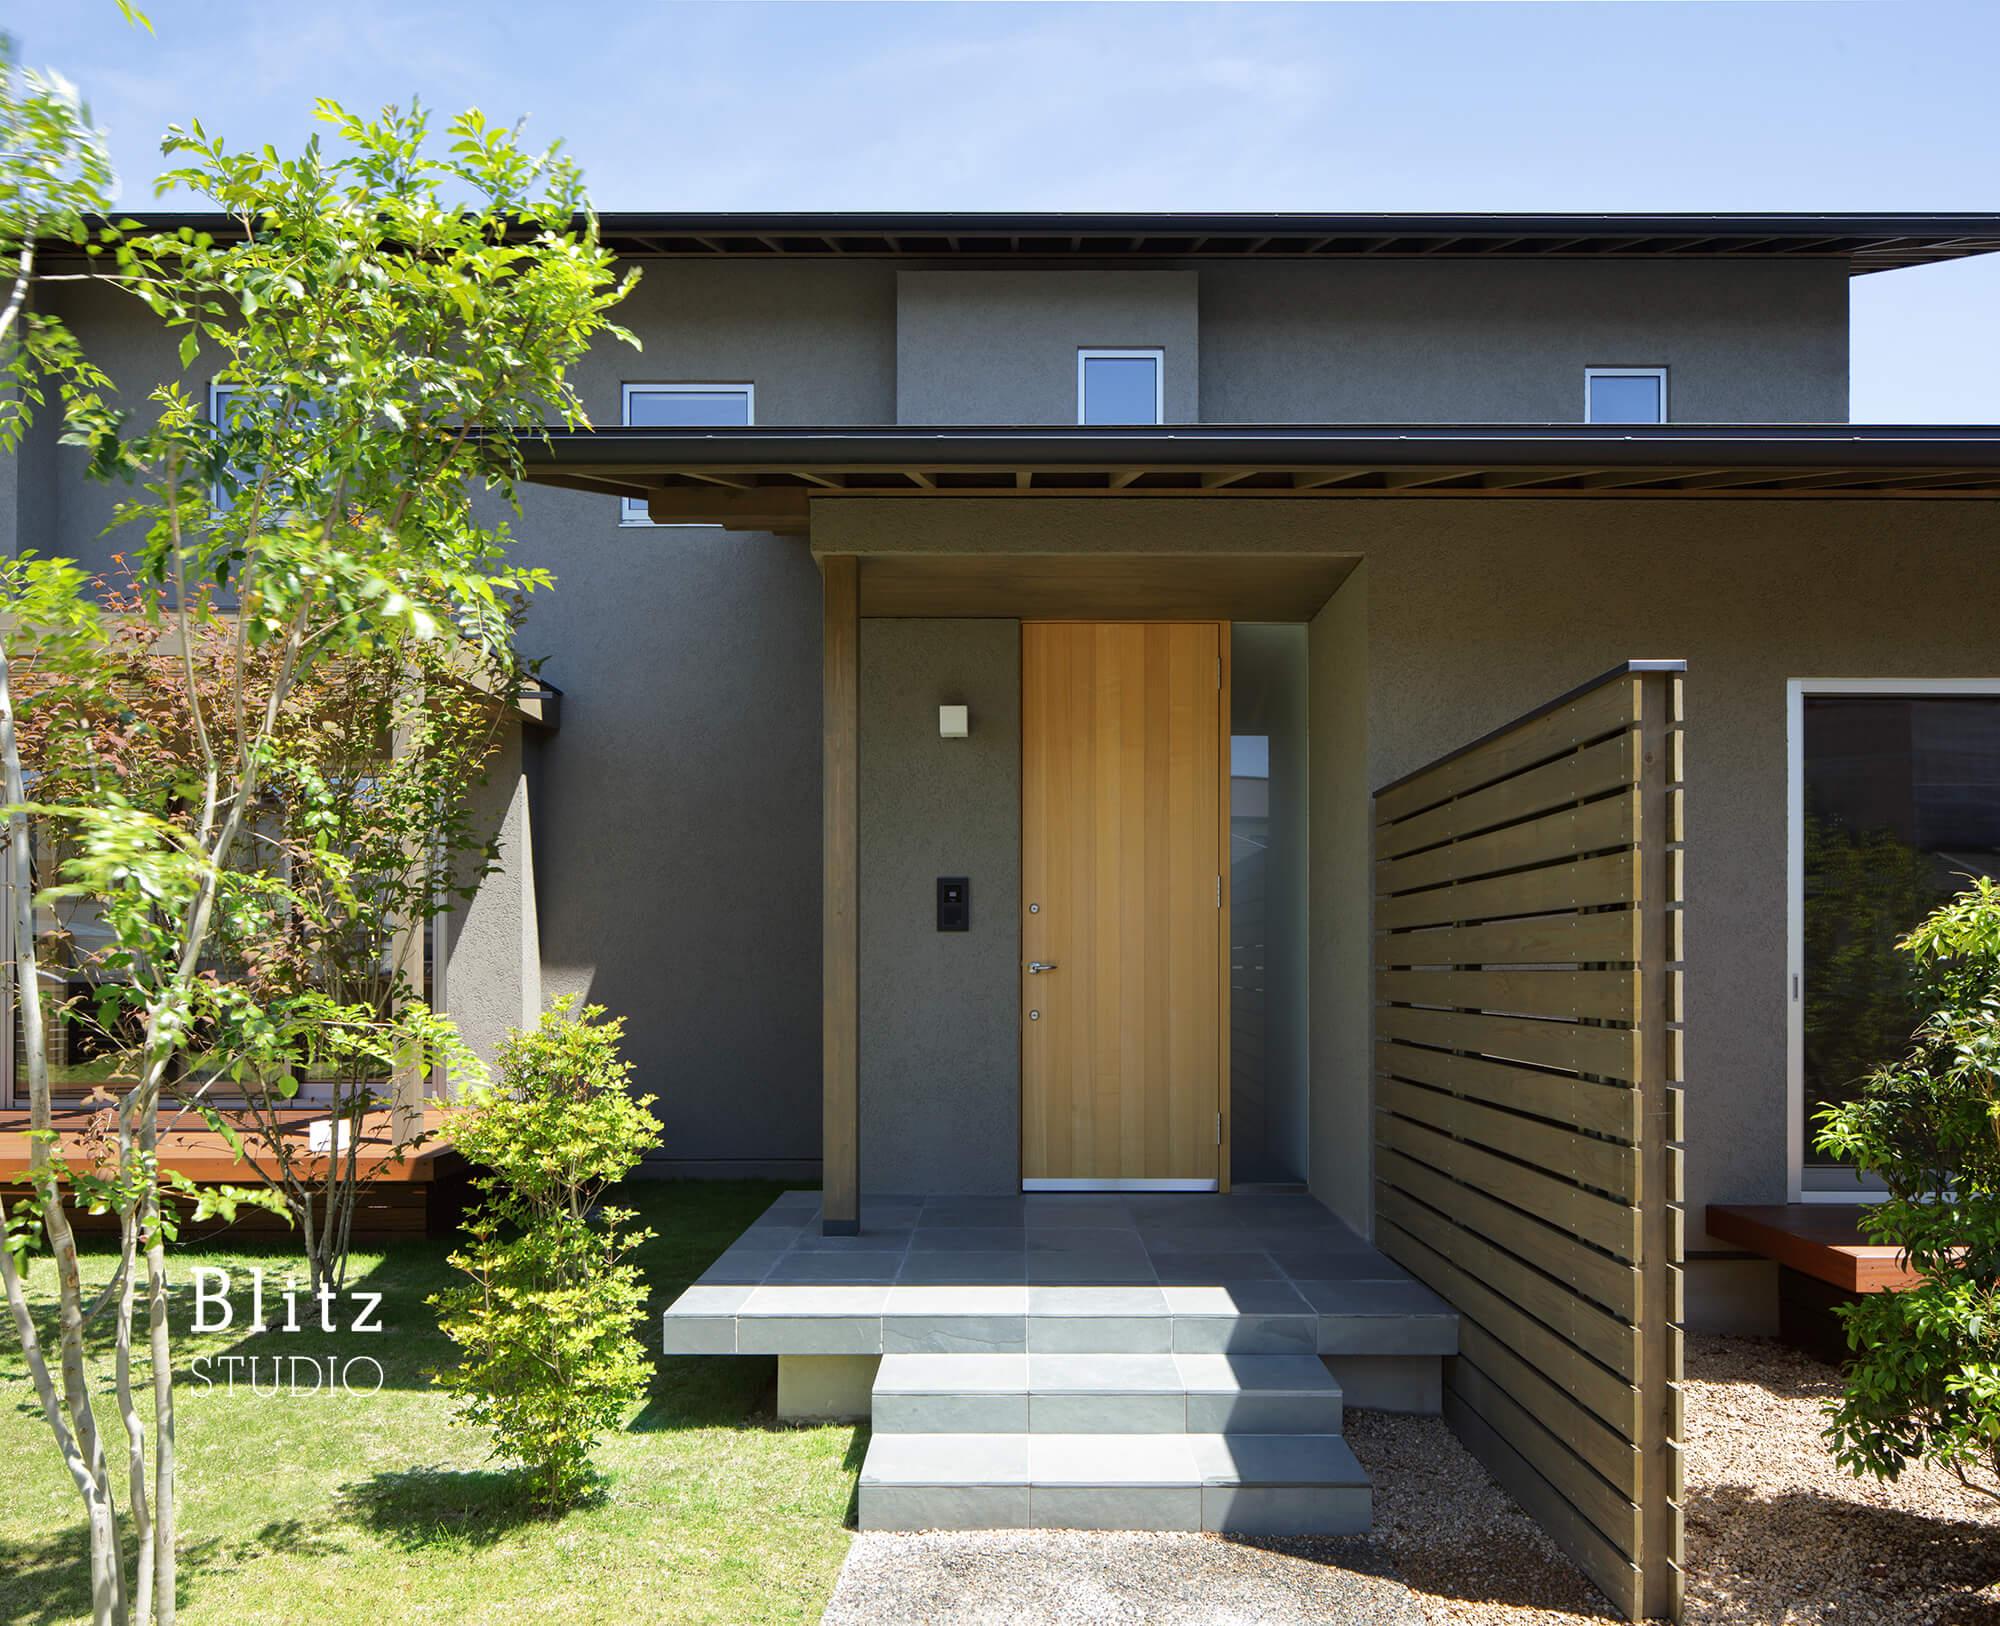 『大和町の家』-佐賀県佐賀市-建築写真・竣工写真・インテリア写真3